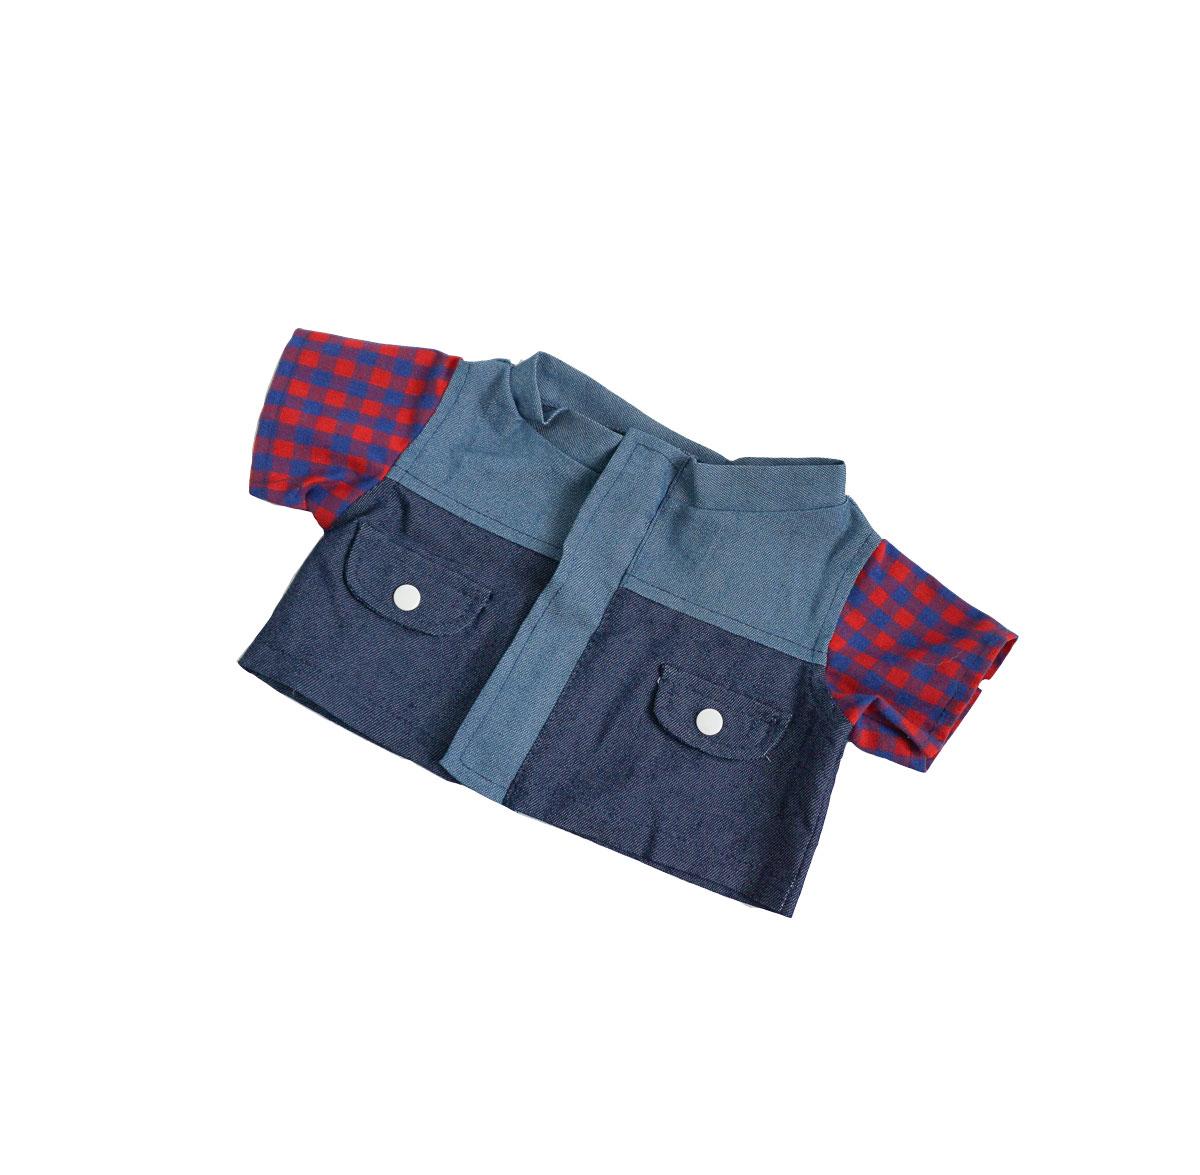 Denim and Plaid Jacket